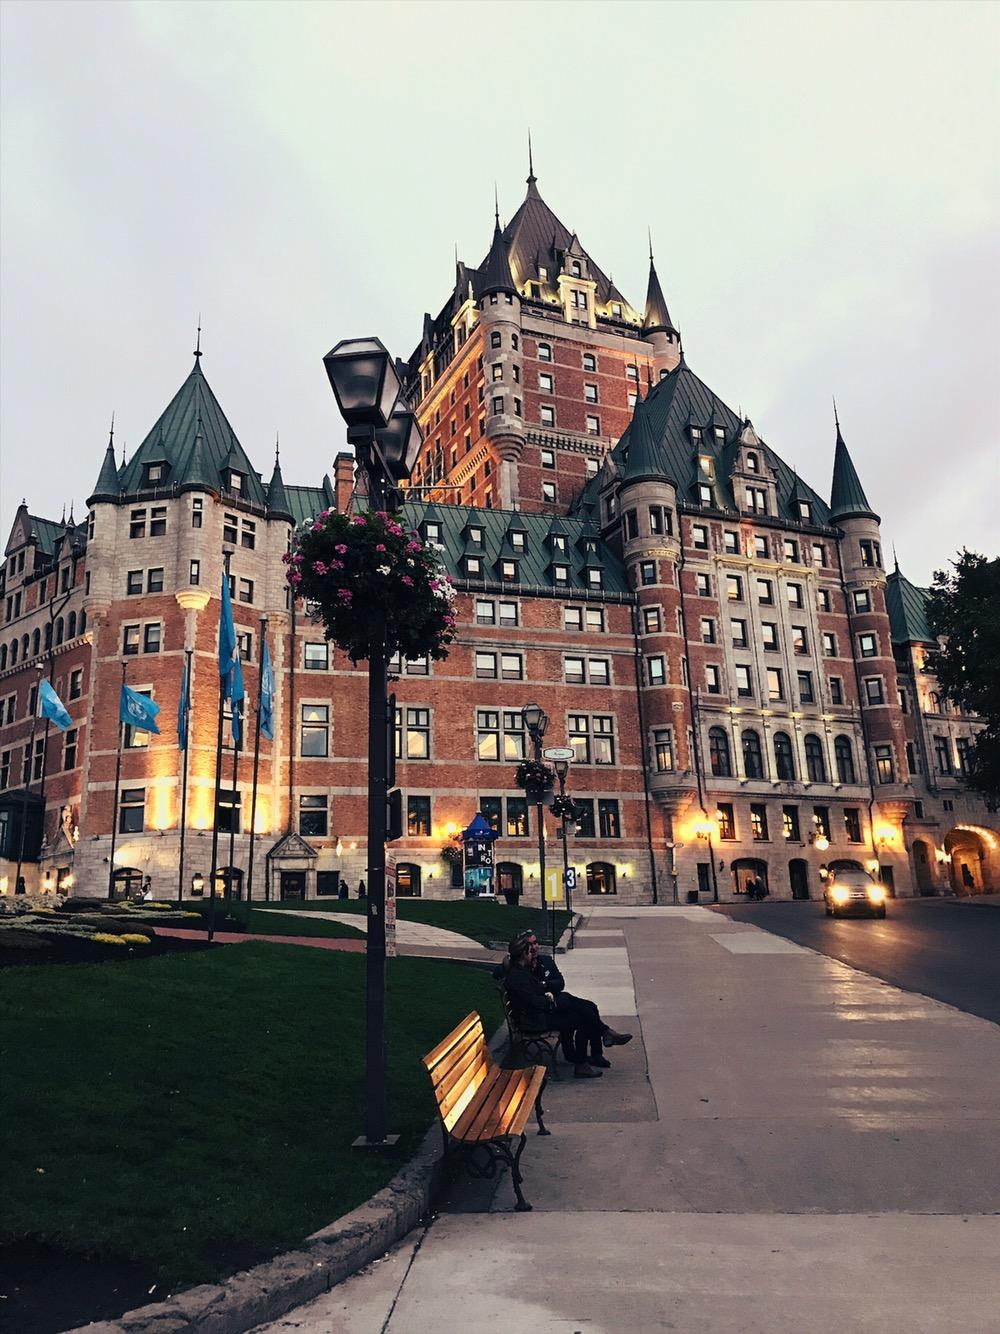 Chateau Frontenac Quebec Canada